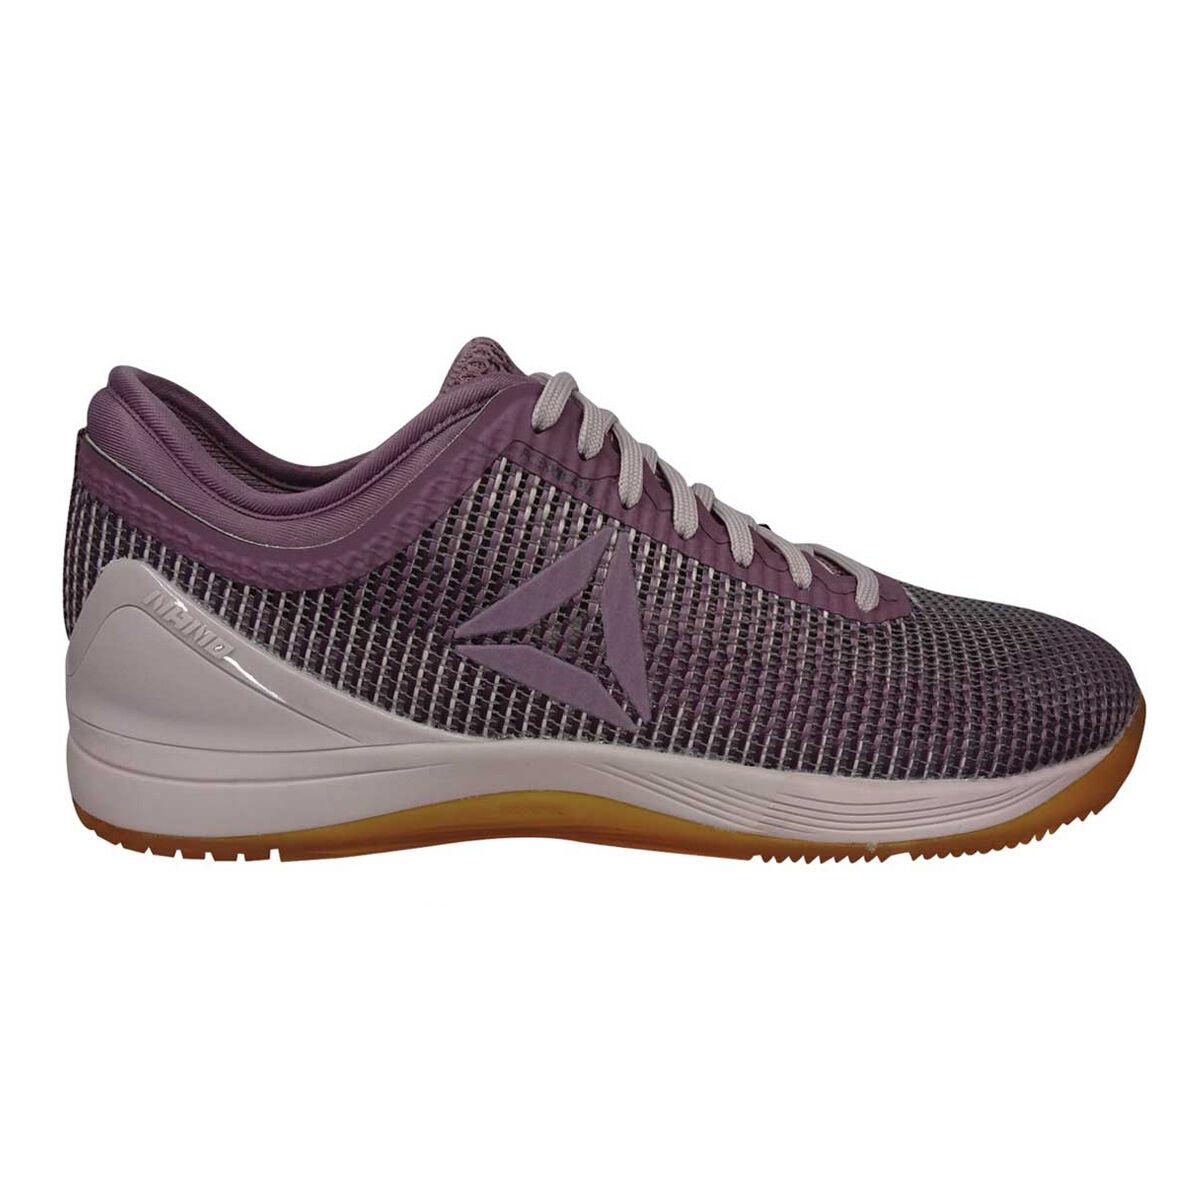 Reebok Crossfit Nano 8.0 Flexweave Womens Training Shoes